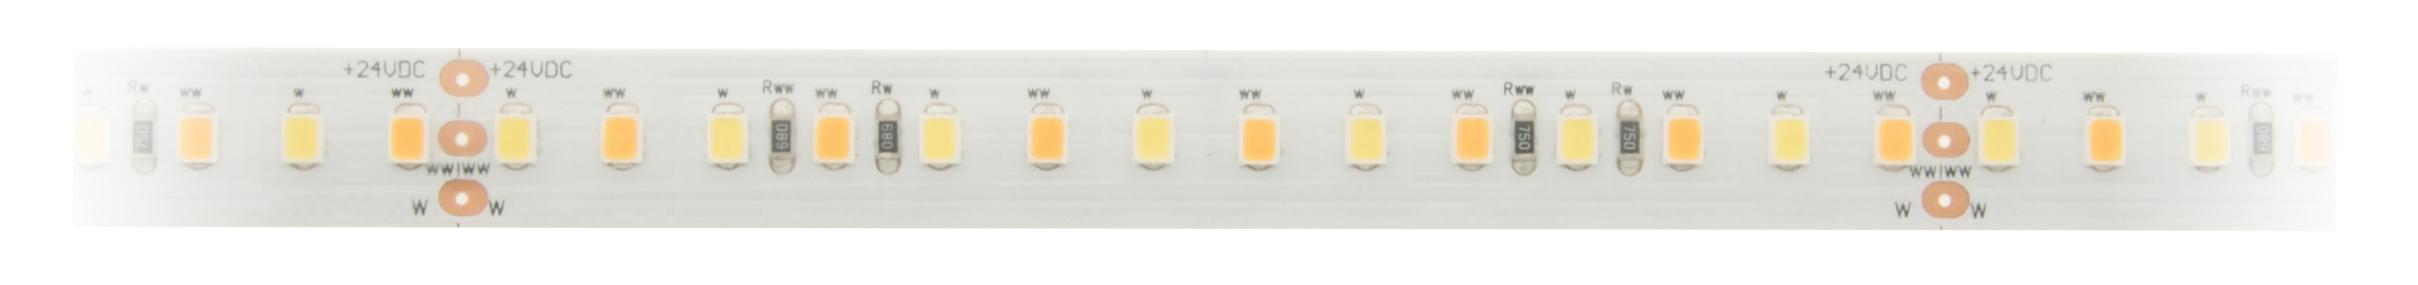 1 Stk Flexstrip 72 DW  100% Mix, 17,2 W/m 1343lm/m 24VDC IP44 l=5m LIFS005104